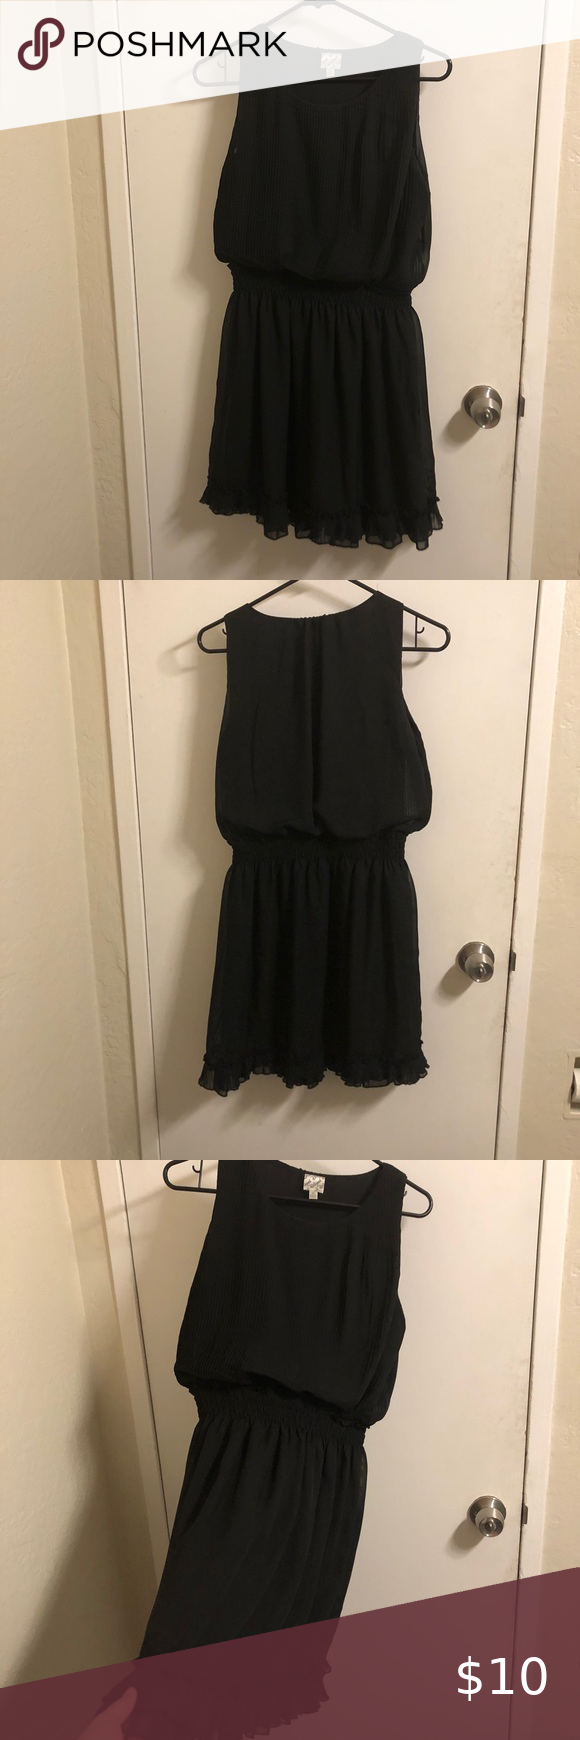 Kids Dress Ruffled Black Dress Vertical Ruffling Top And Bottom With Elastic Break Band And More Ruffles At The Bottom D Kids Dress Black Ruffle Dress Dresses [ 1740 x 580 Pixel ]